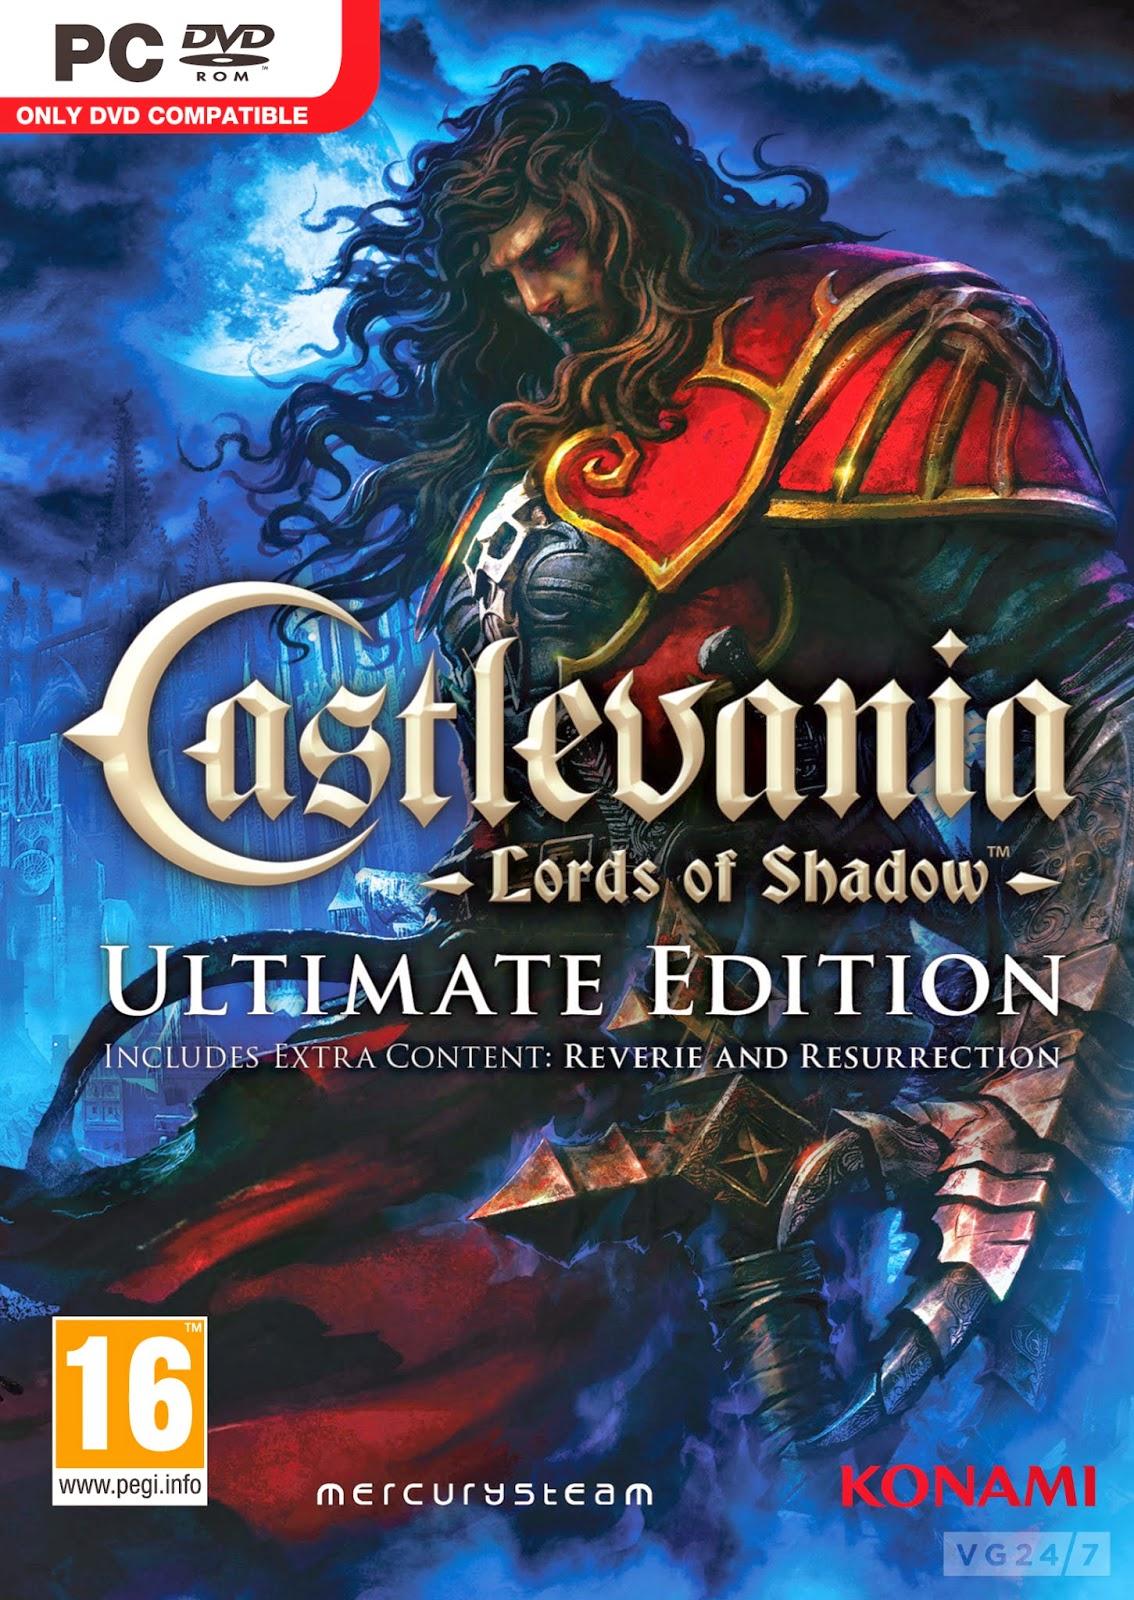 Castlevania Lords of Shadow 2 - PC BlackBox